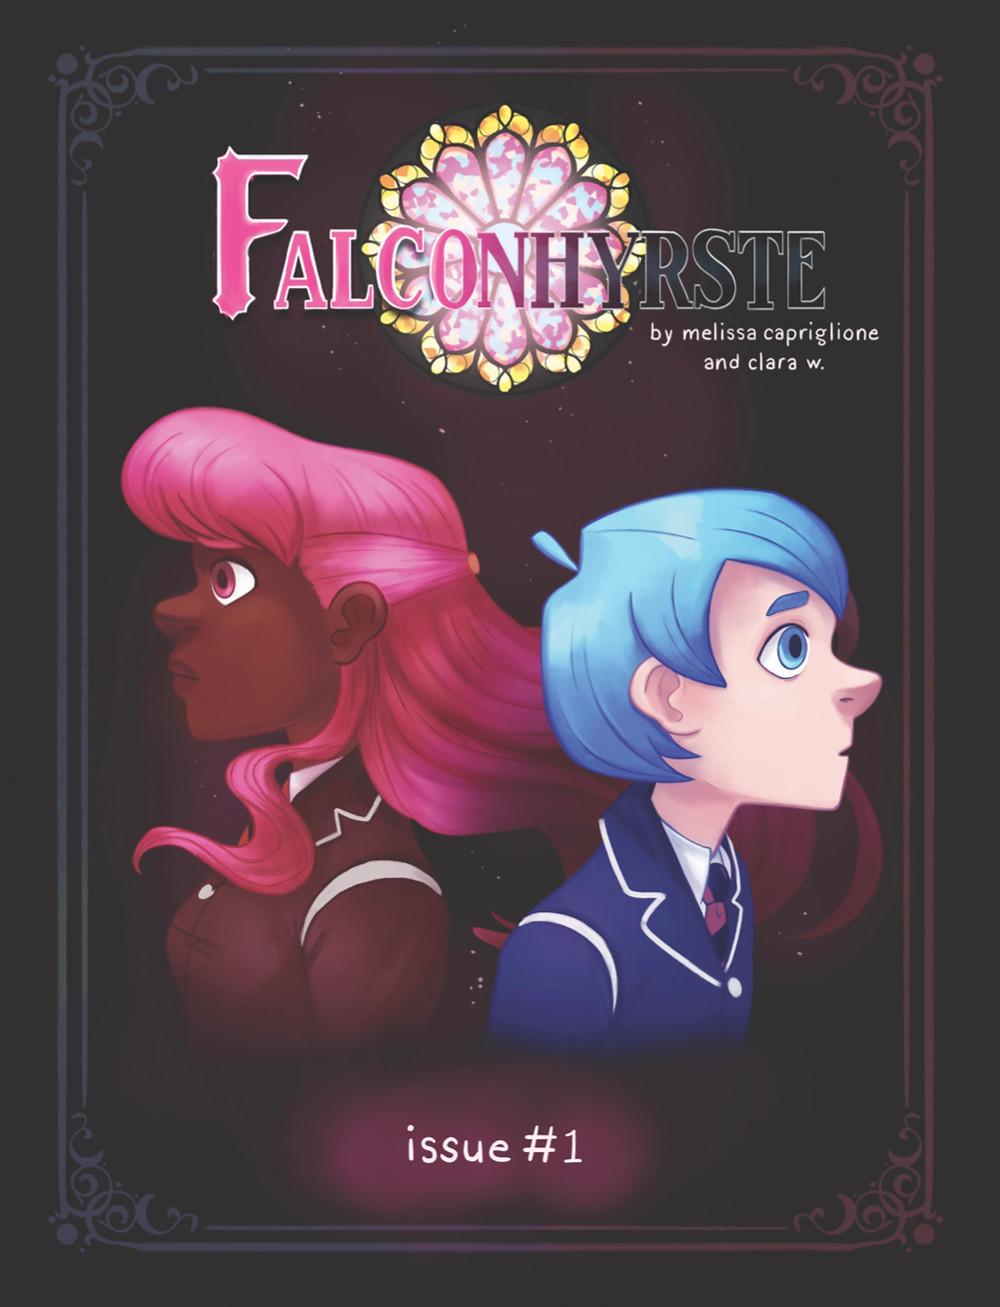 Falconhyrste, issue #1, cover, Self-published, Capriglione/Clara W.